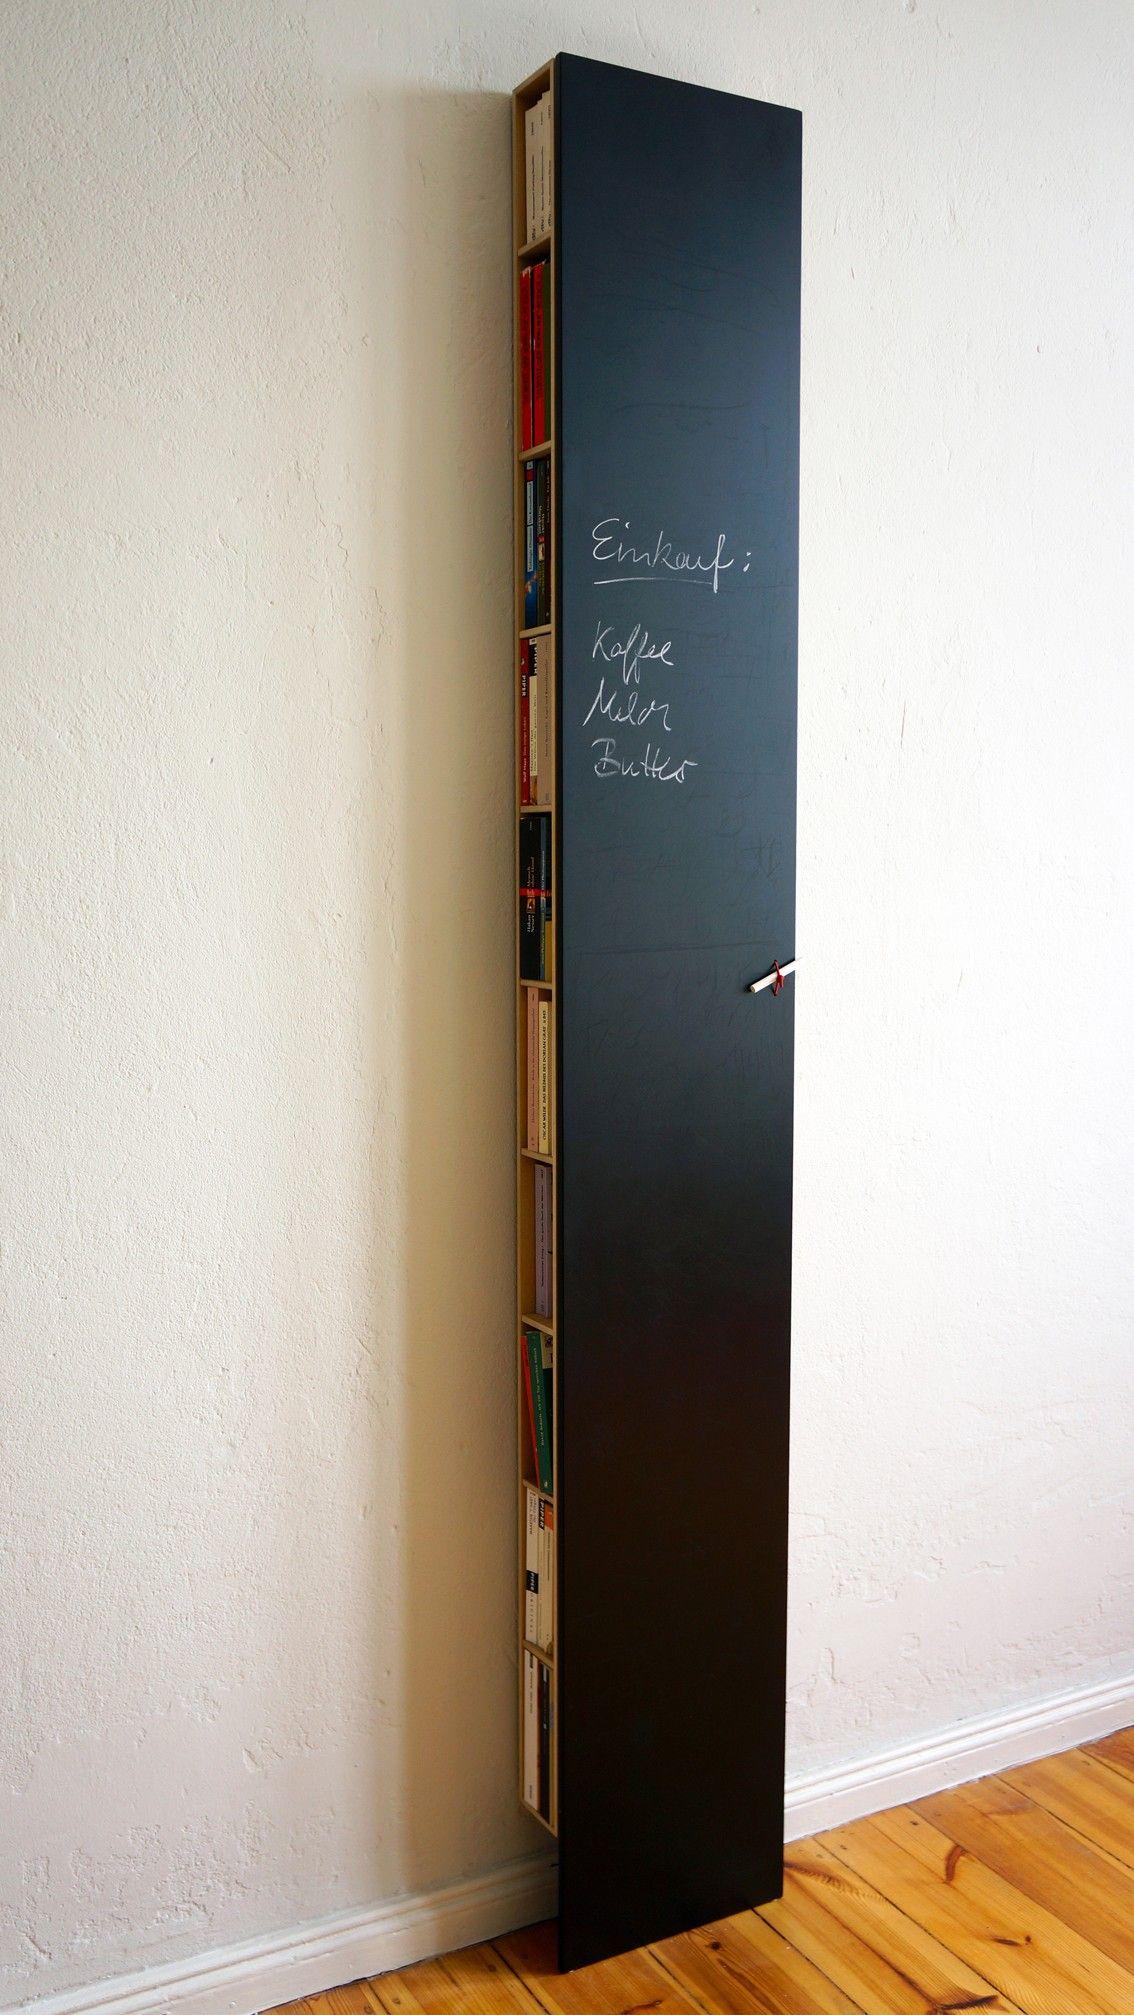 Bux Regal. Flaches Wandregal, das Kochbücher, CDs und vieles ...